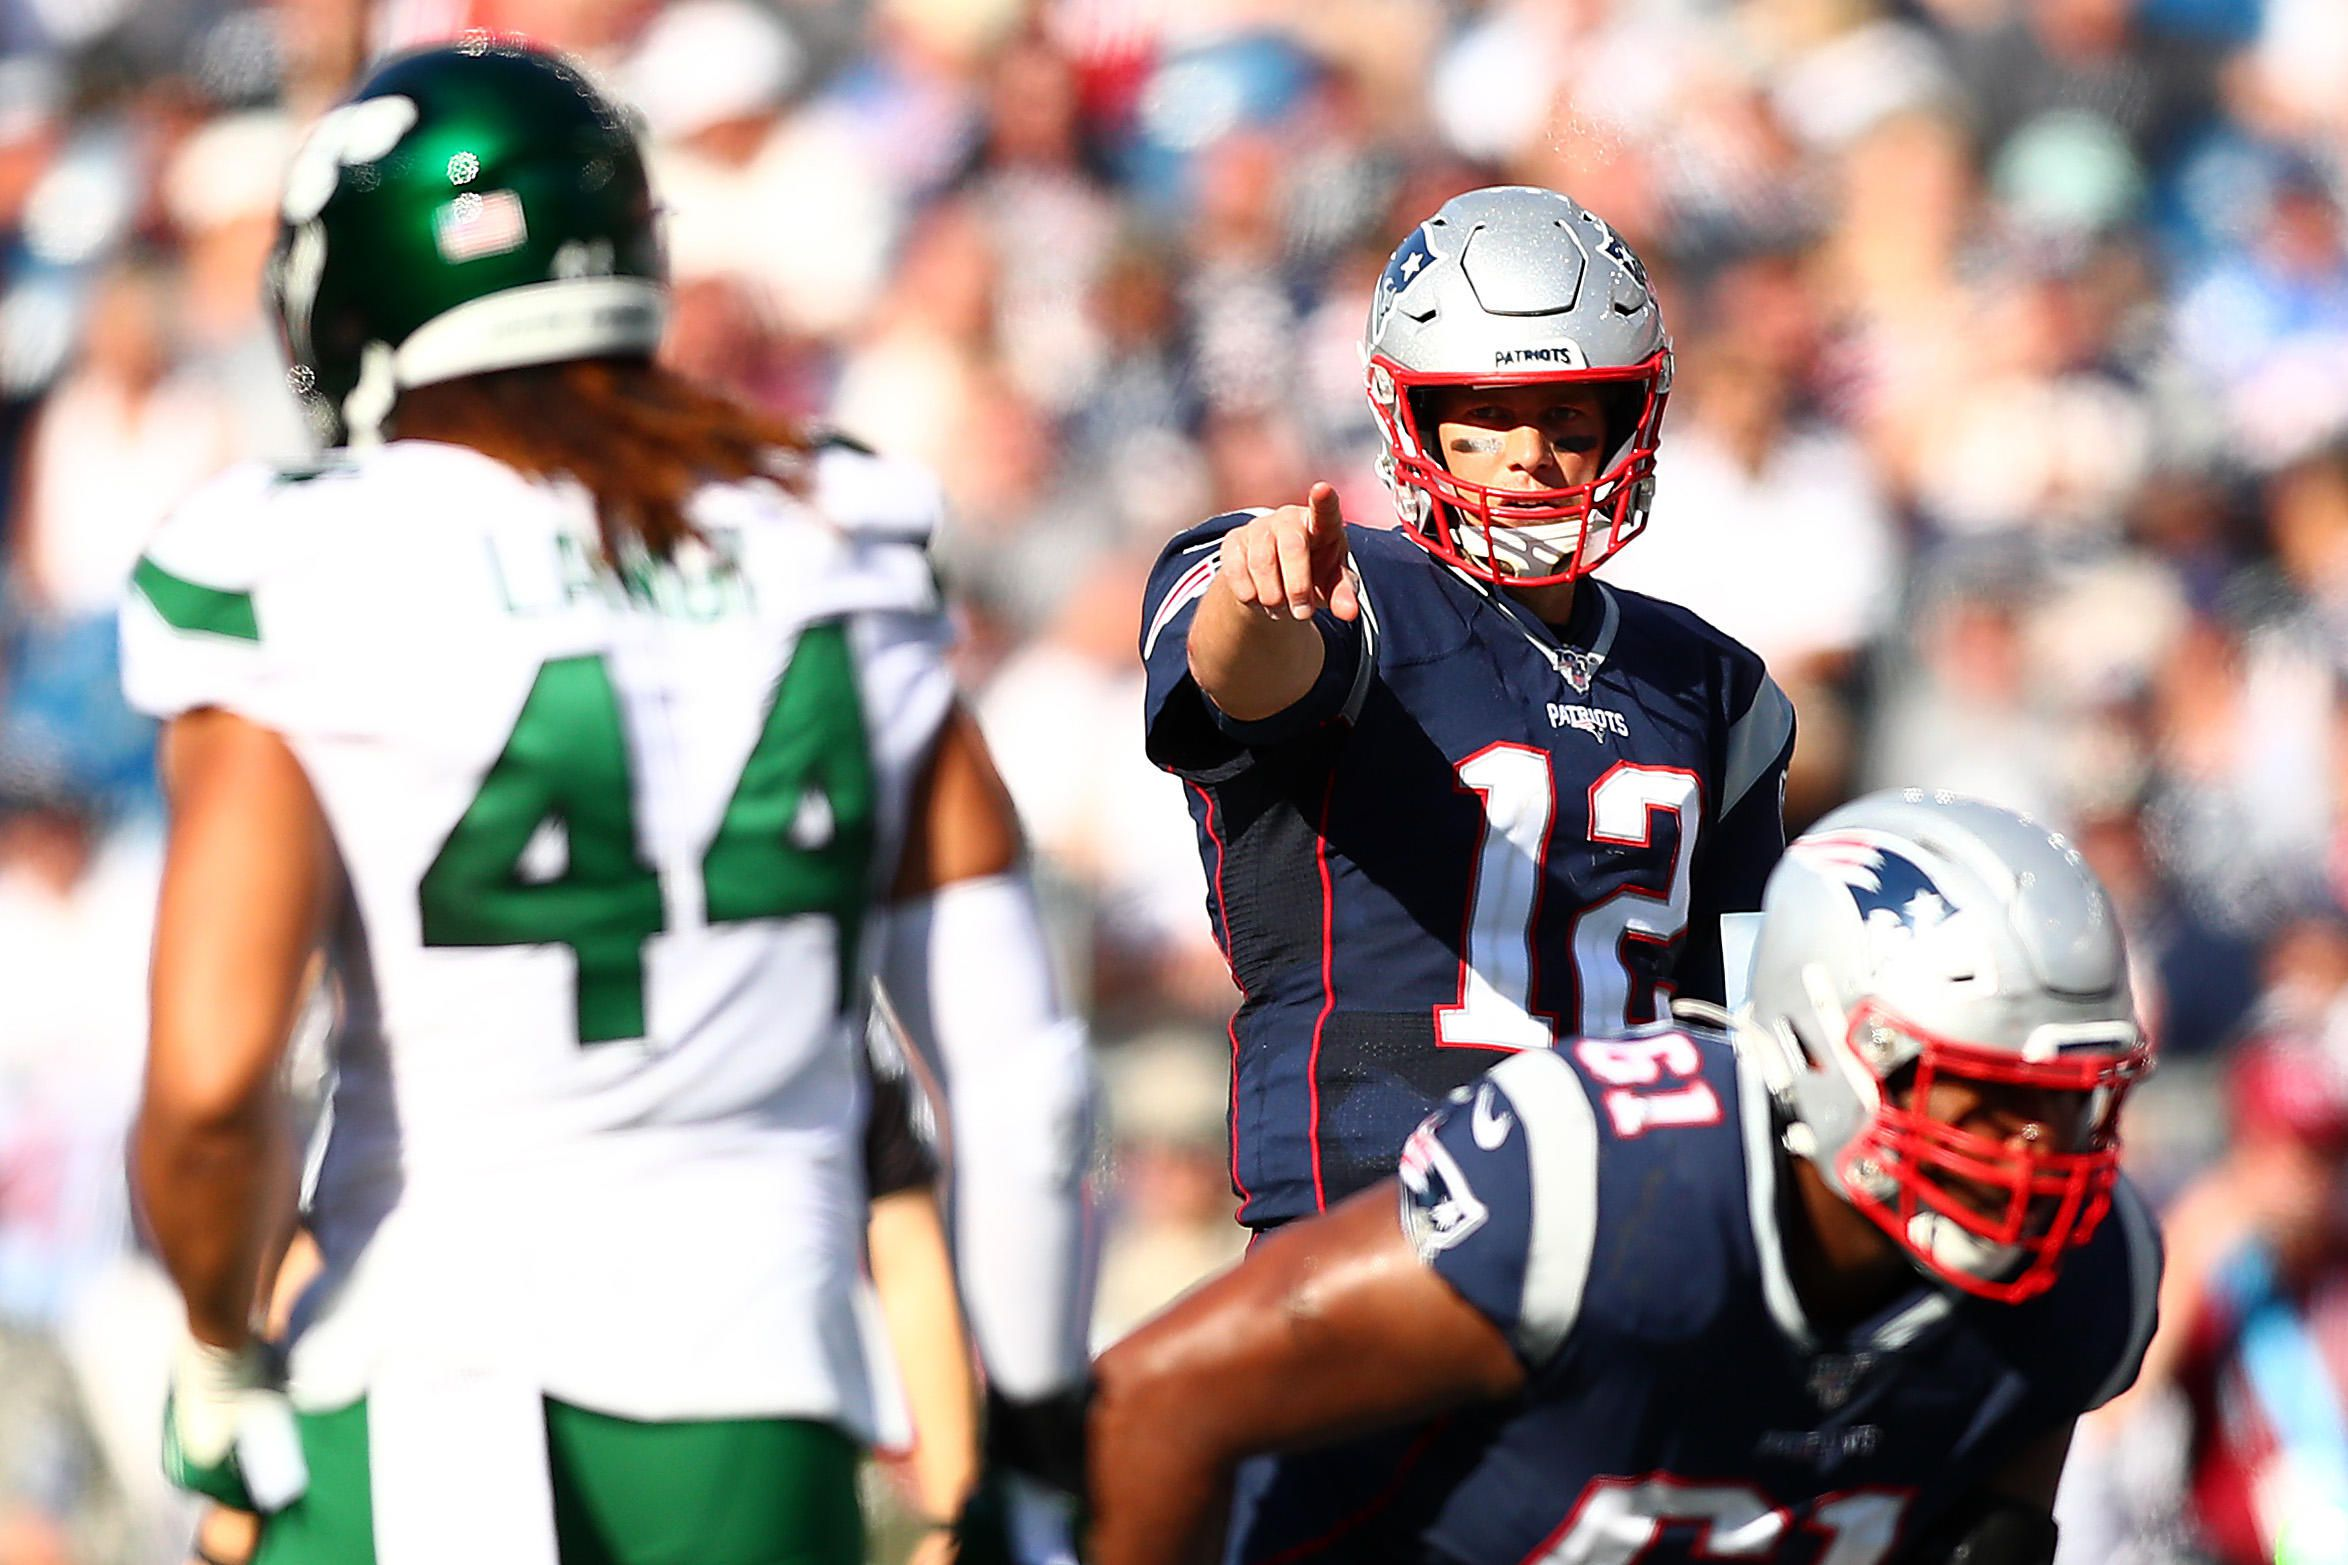 Patriots vs. Jets